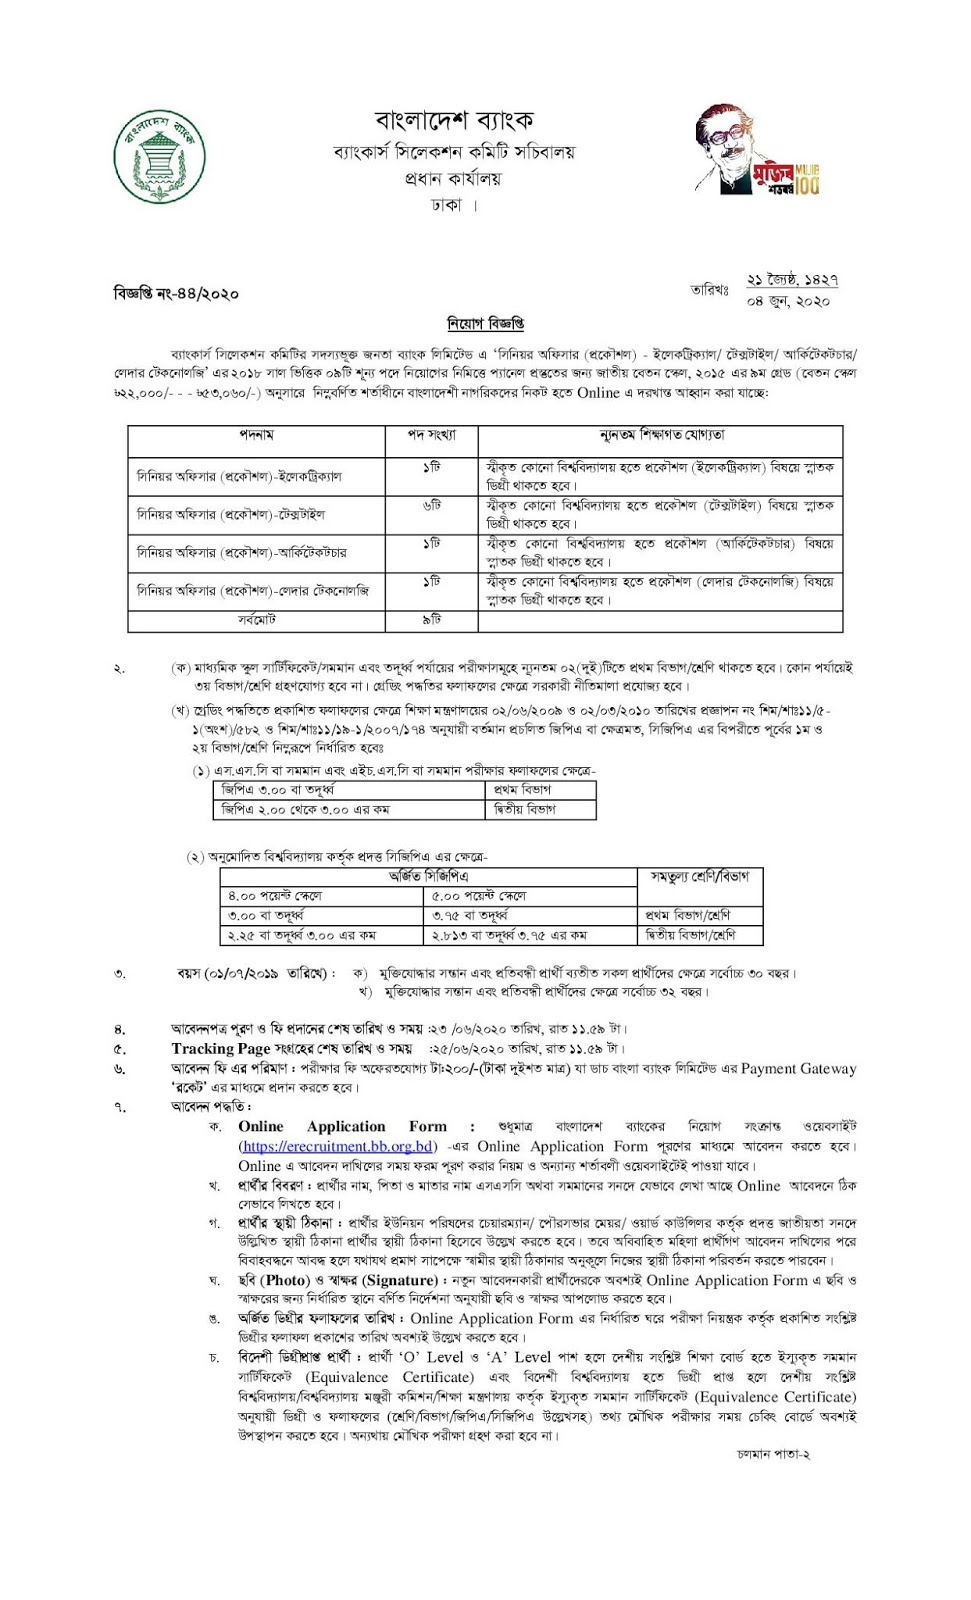 Janata Bank Ltd Job Circular 2020